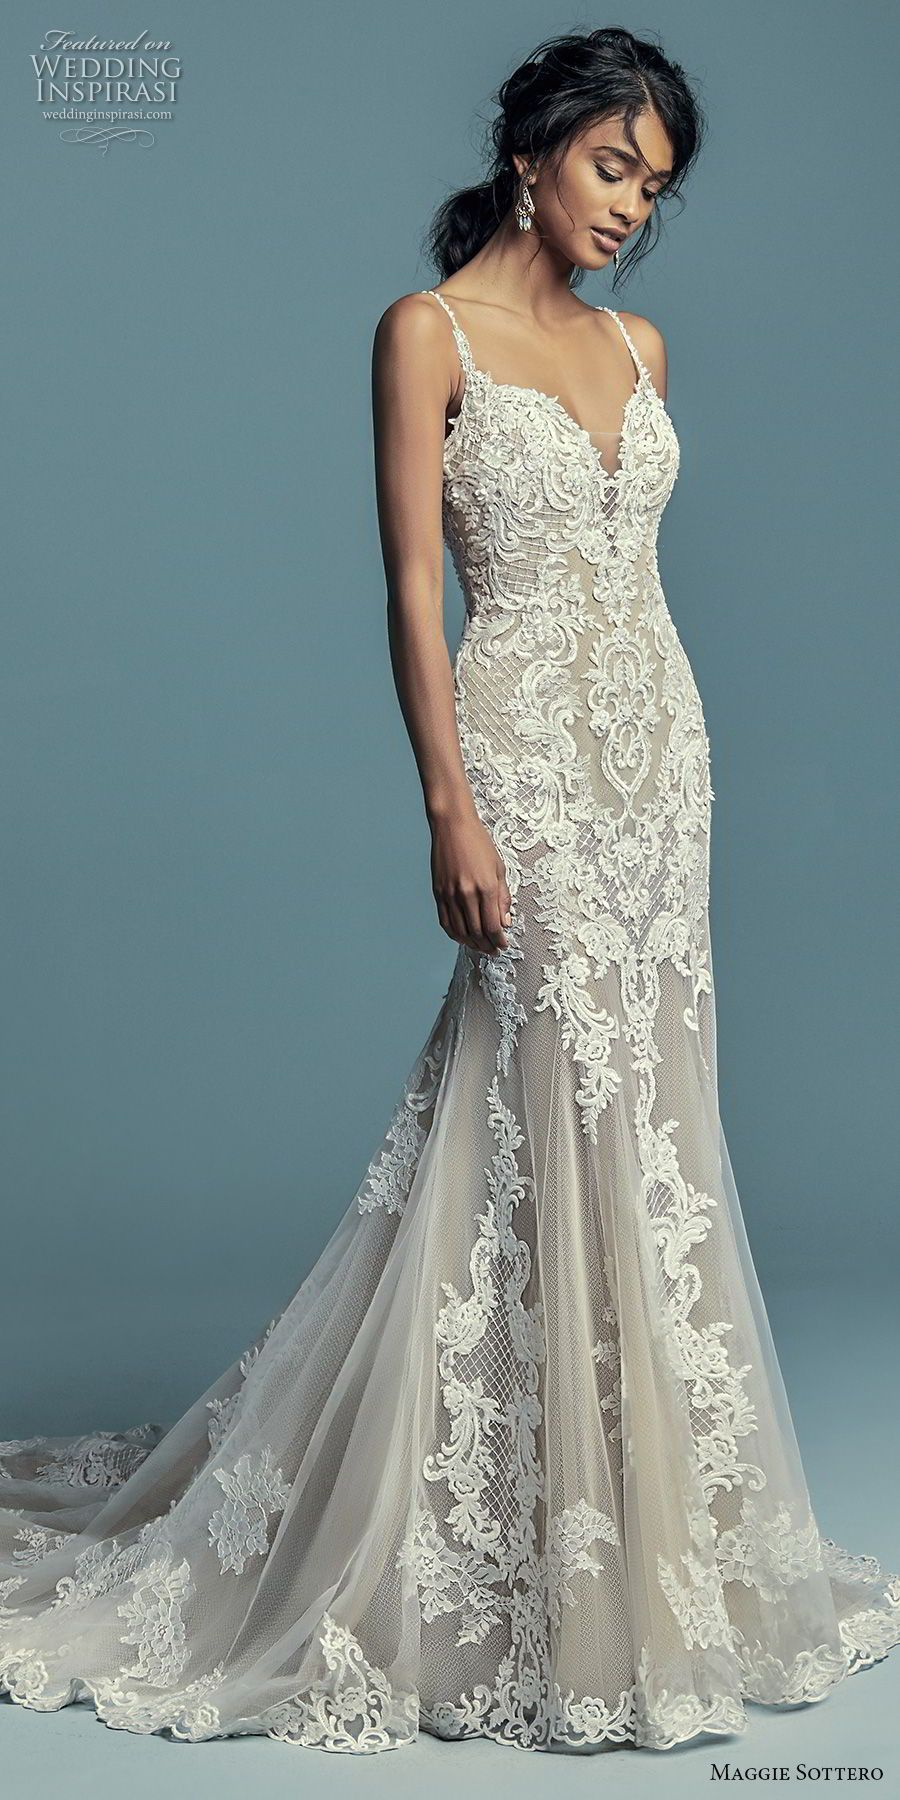 Elegant mermaid wedding dresses  maggie sottero fall  bridal sleeveless thin strap sweetheart